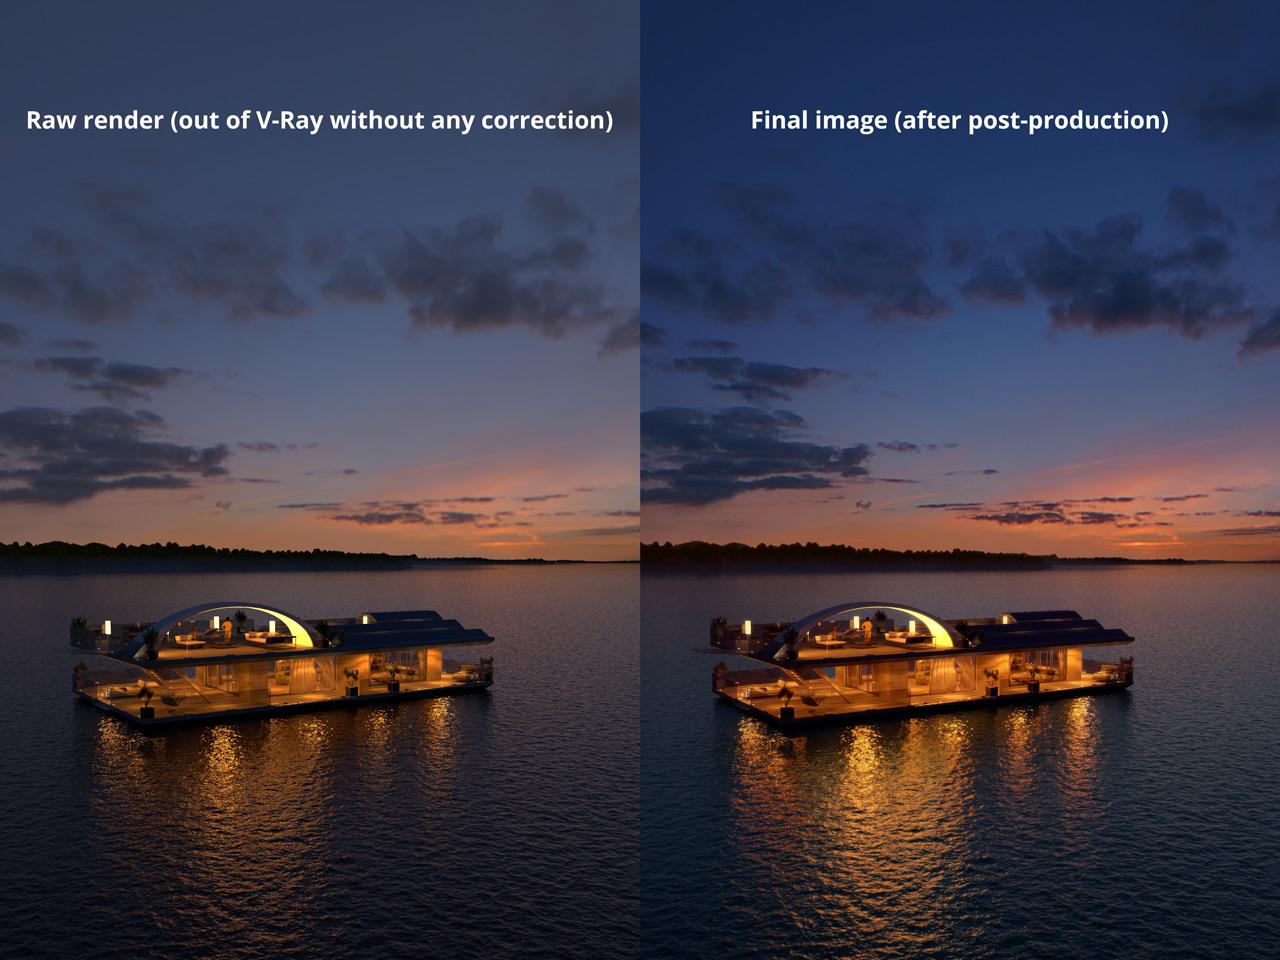 Tuto_cabin_lake_Post_production_comparaison.jpg